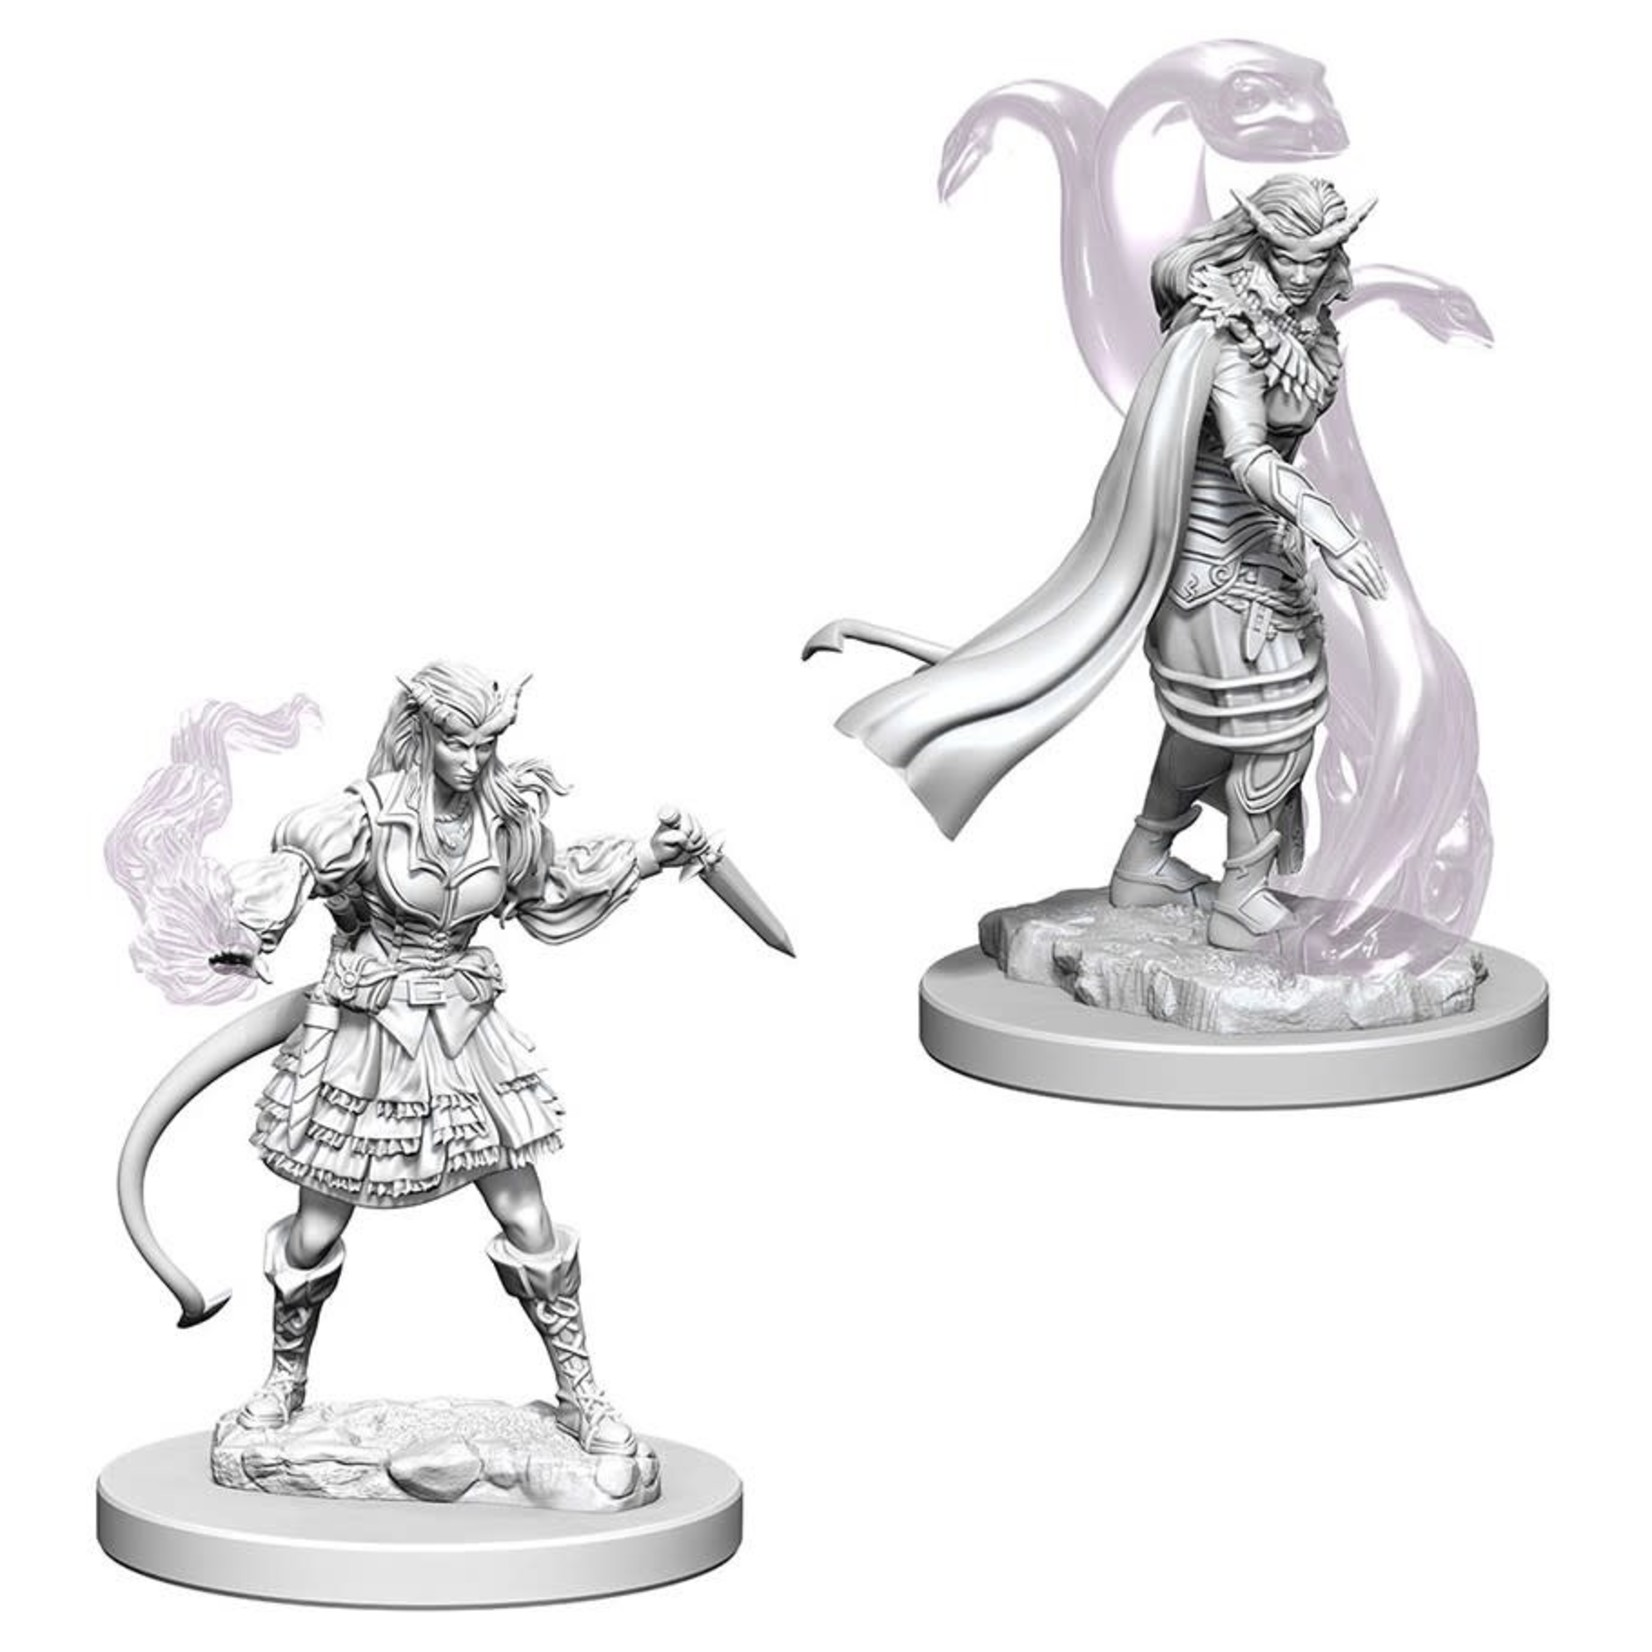 WizKids/Neca 73202 Nolzur's Tiefling Female Sorcerer